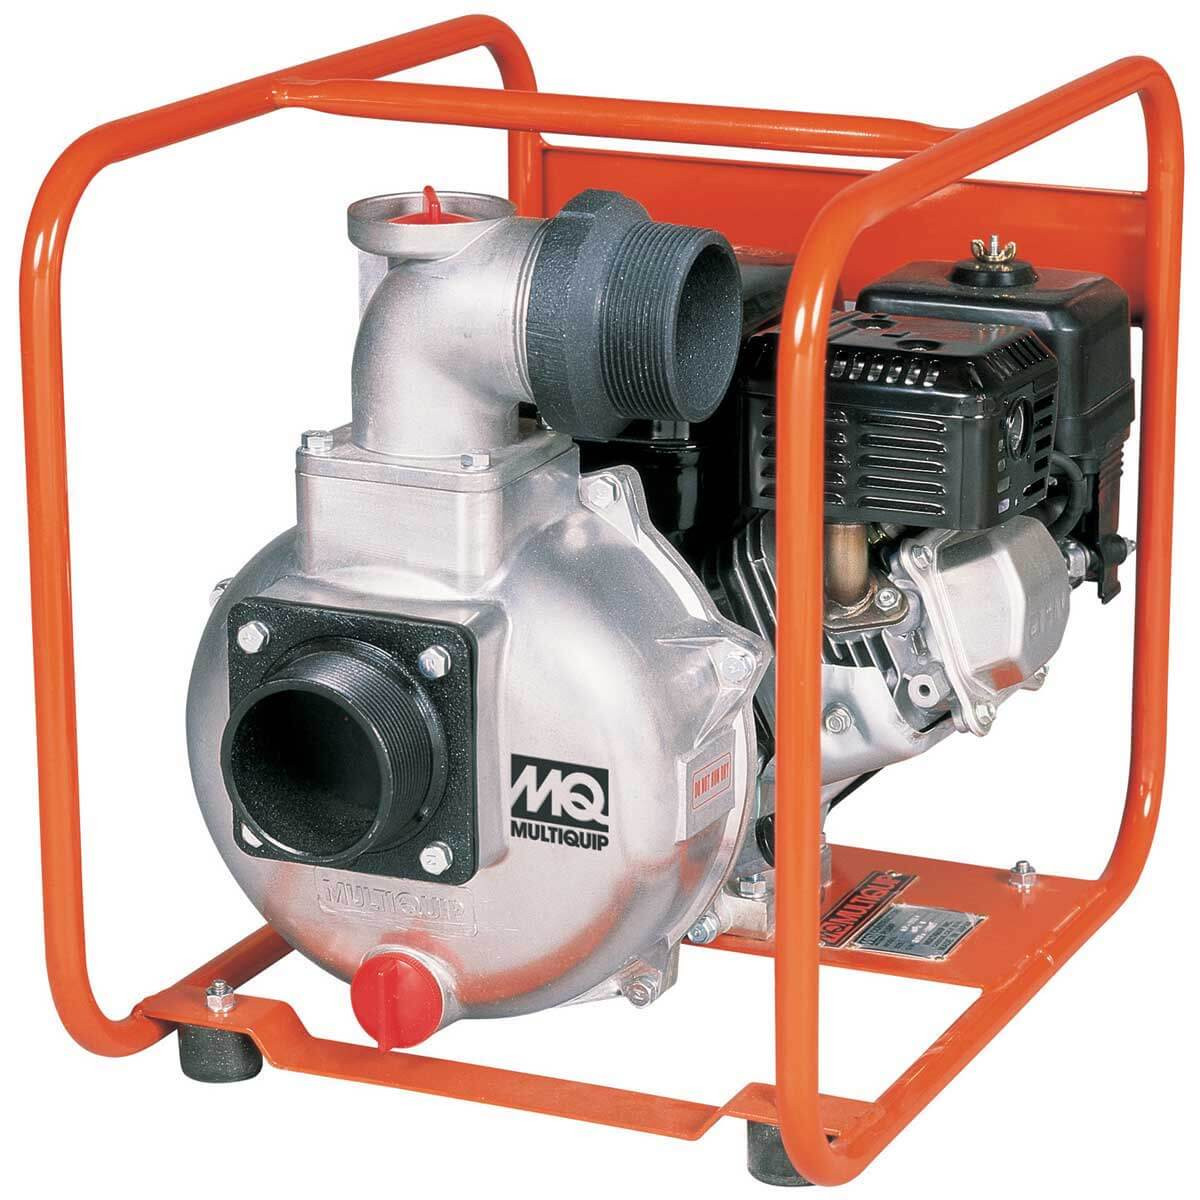 MultiQuip QP303H Dewatering Pump